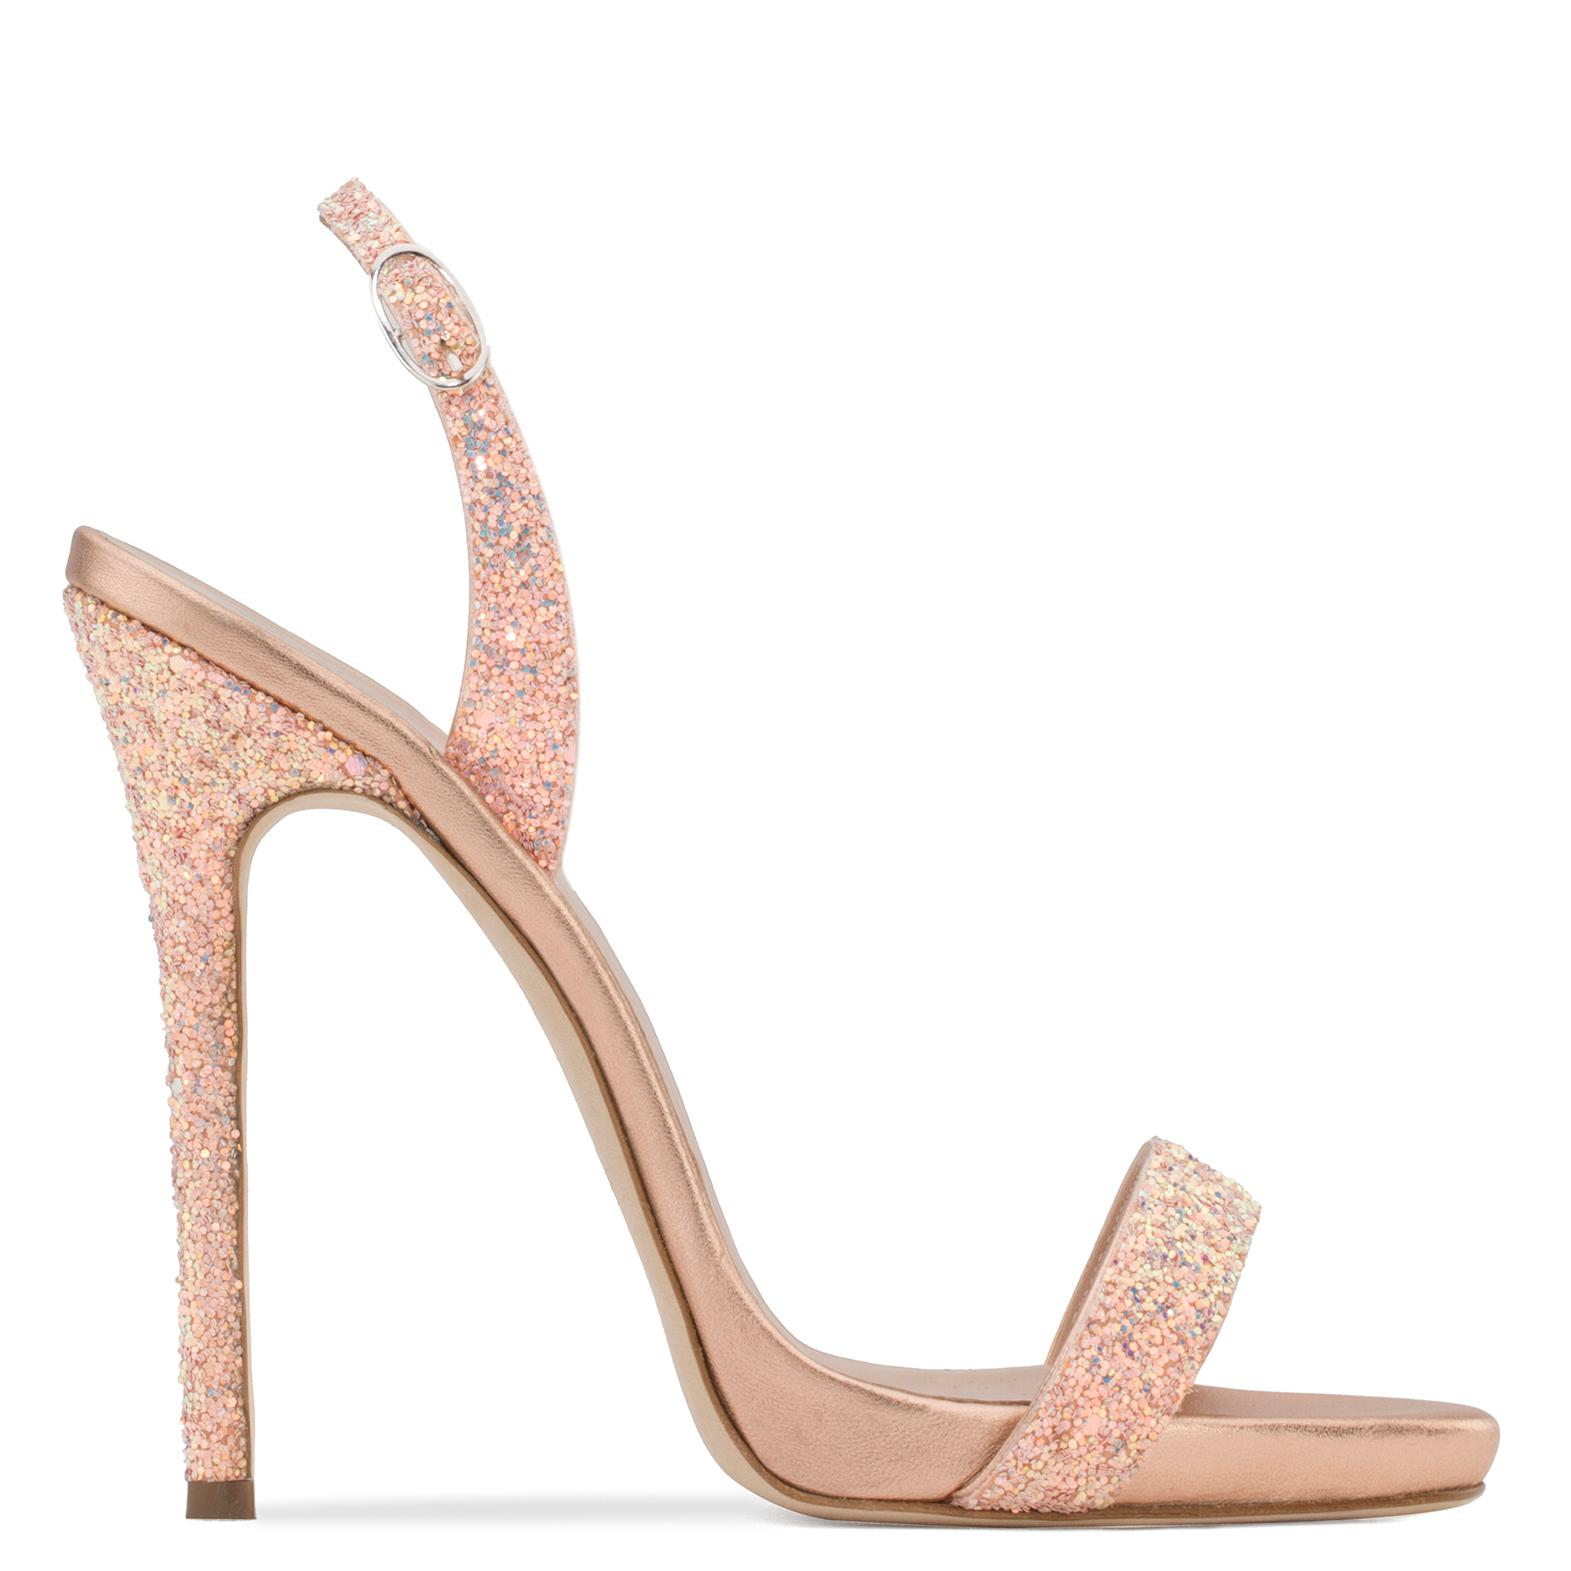 Giuseppe Zanotti Glitter fabric sandal SOPHIE GLITTER WqW8c2BH9K